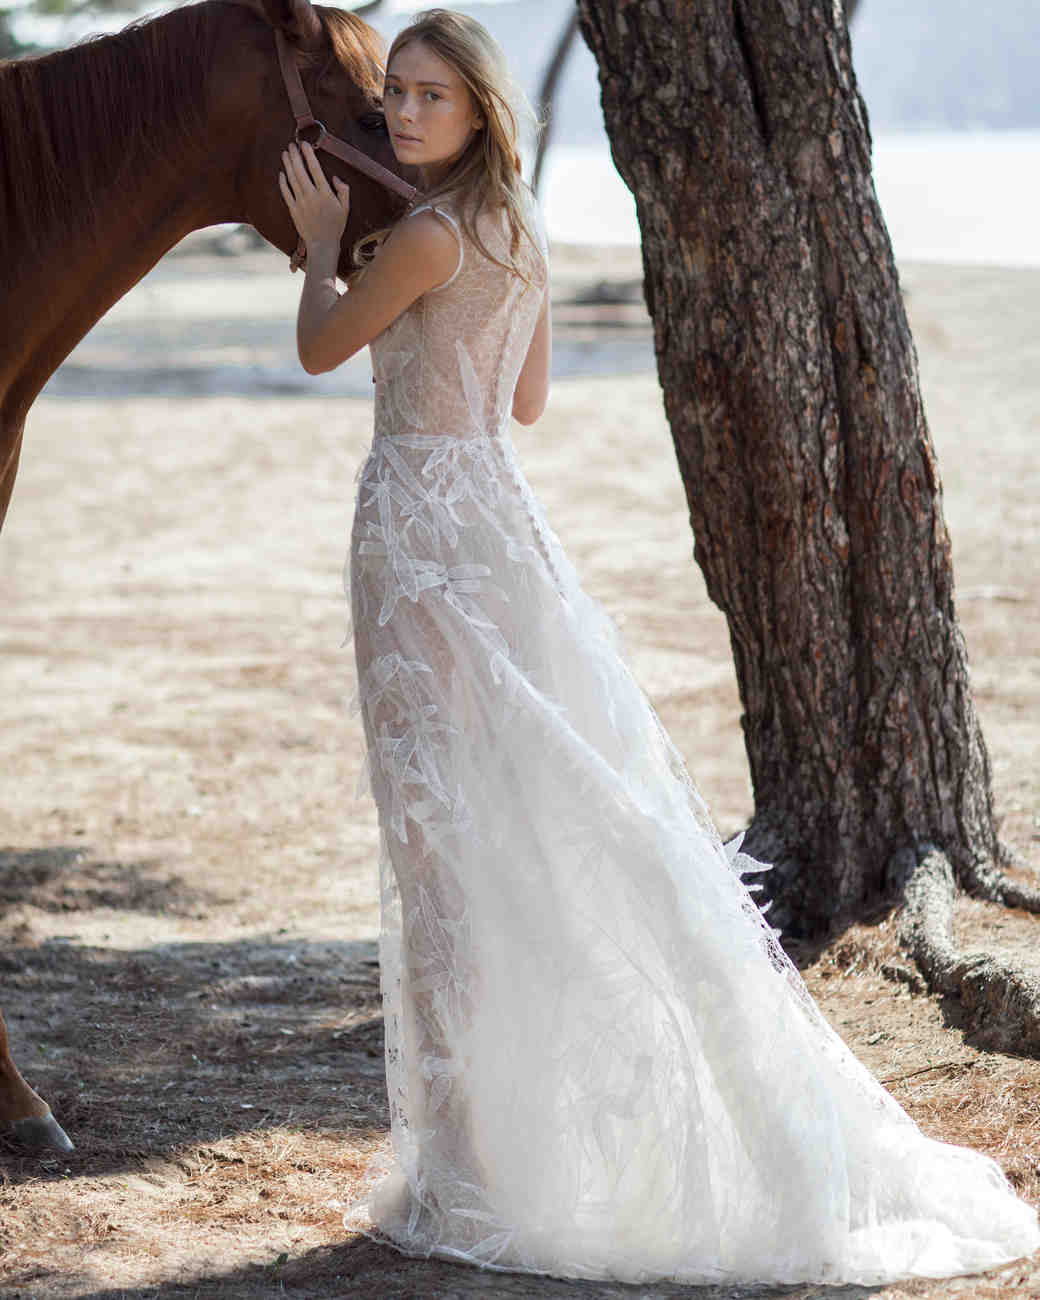 costarellos-fall2016-wedding-dress-16-27.jpg